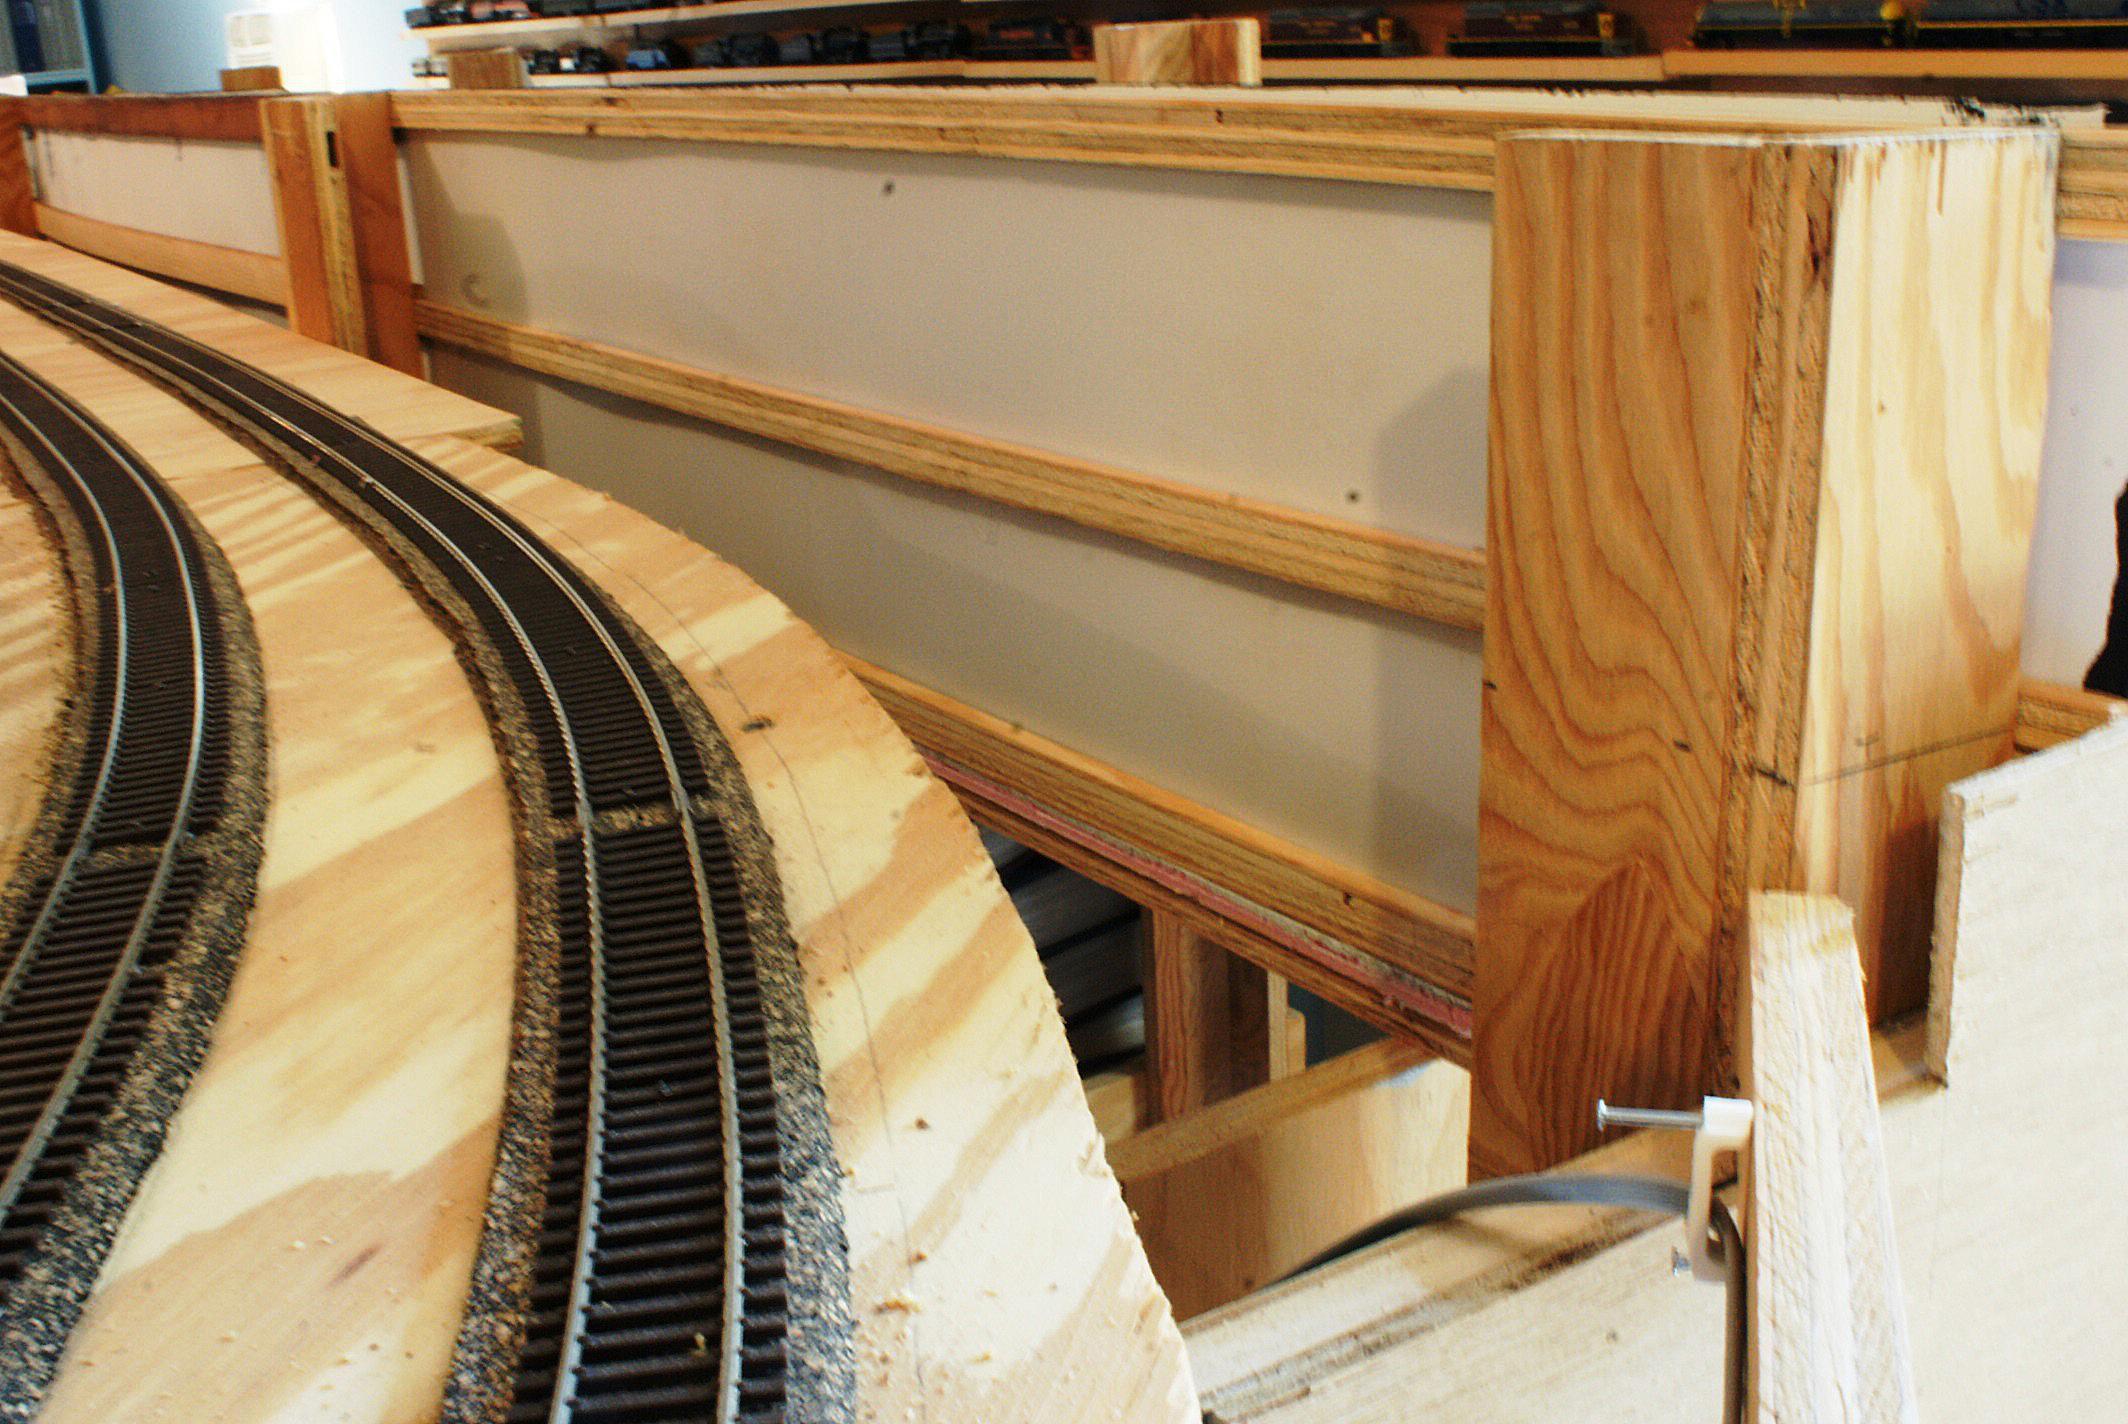 building model railroad backdrops. Black Bedroom Furniture Sets. Home Design Ideas